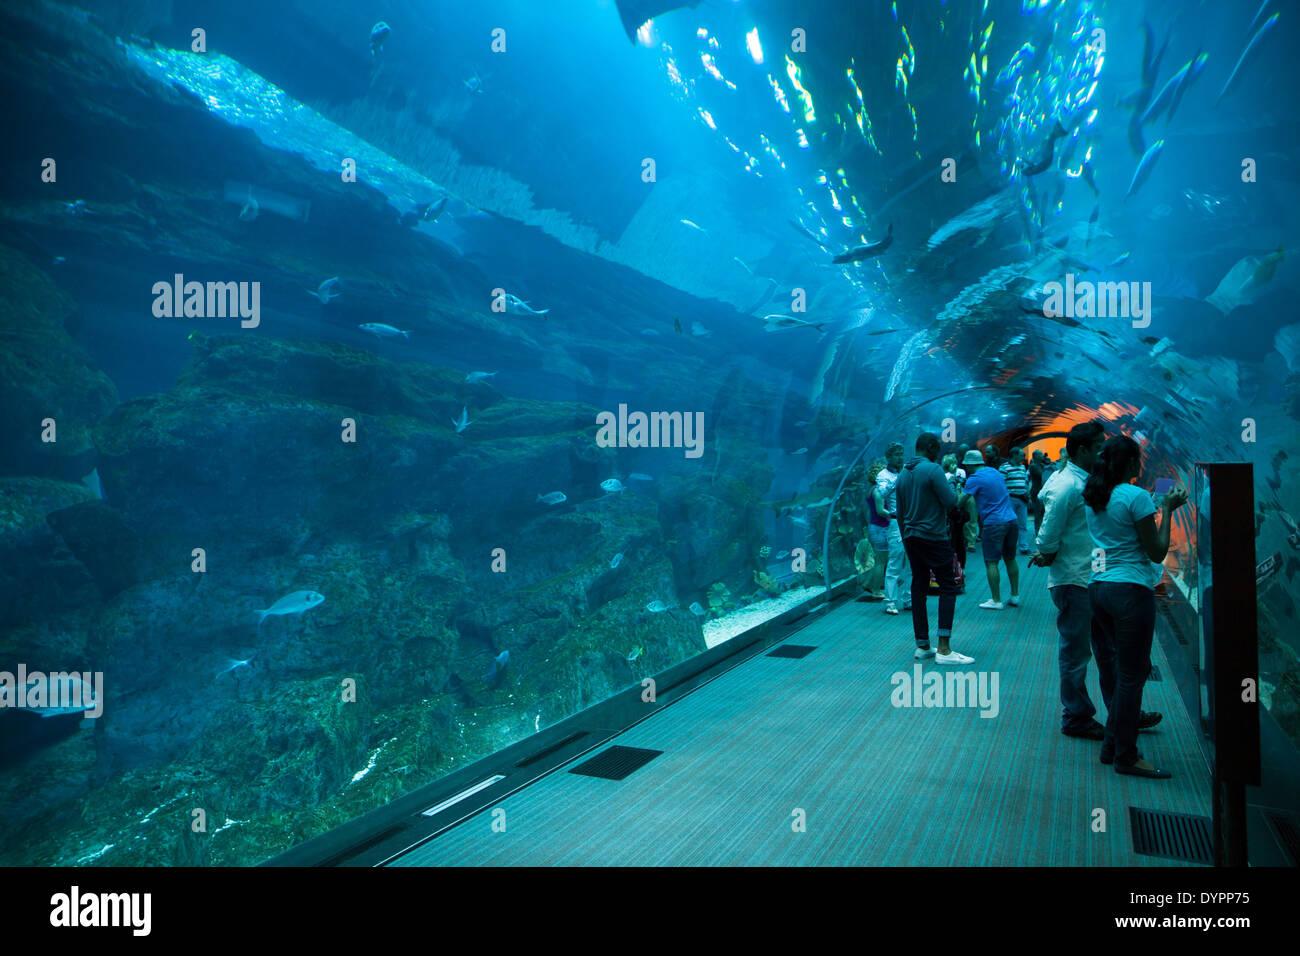 dubai aquarium tunnel at dubai mall in dubai business bay uae stock photo royalty free image. Black Bedroom Furniture Sets. Home Design Ideas